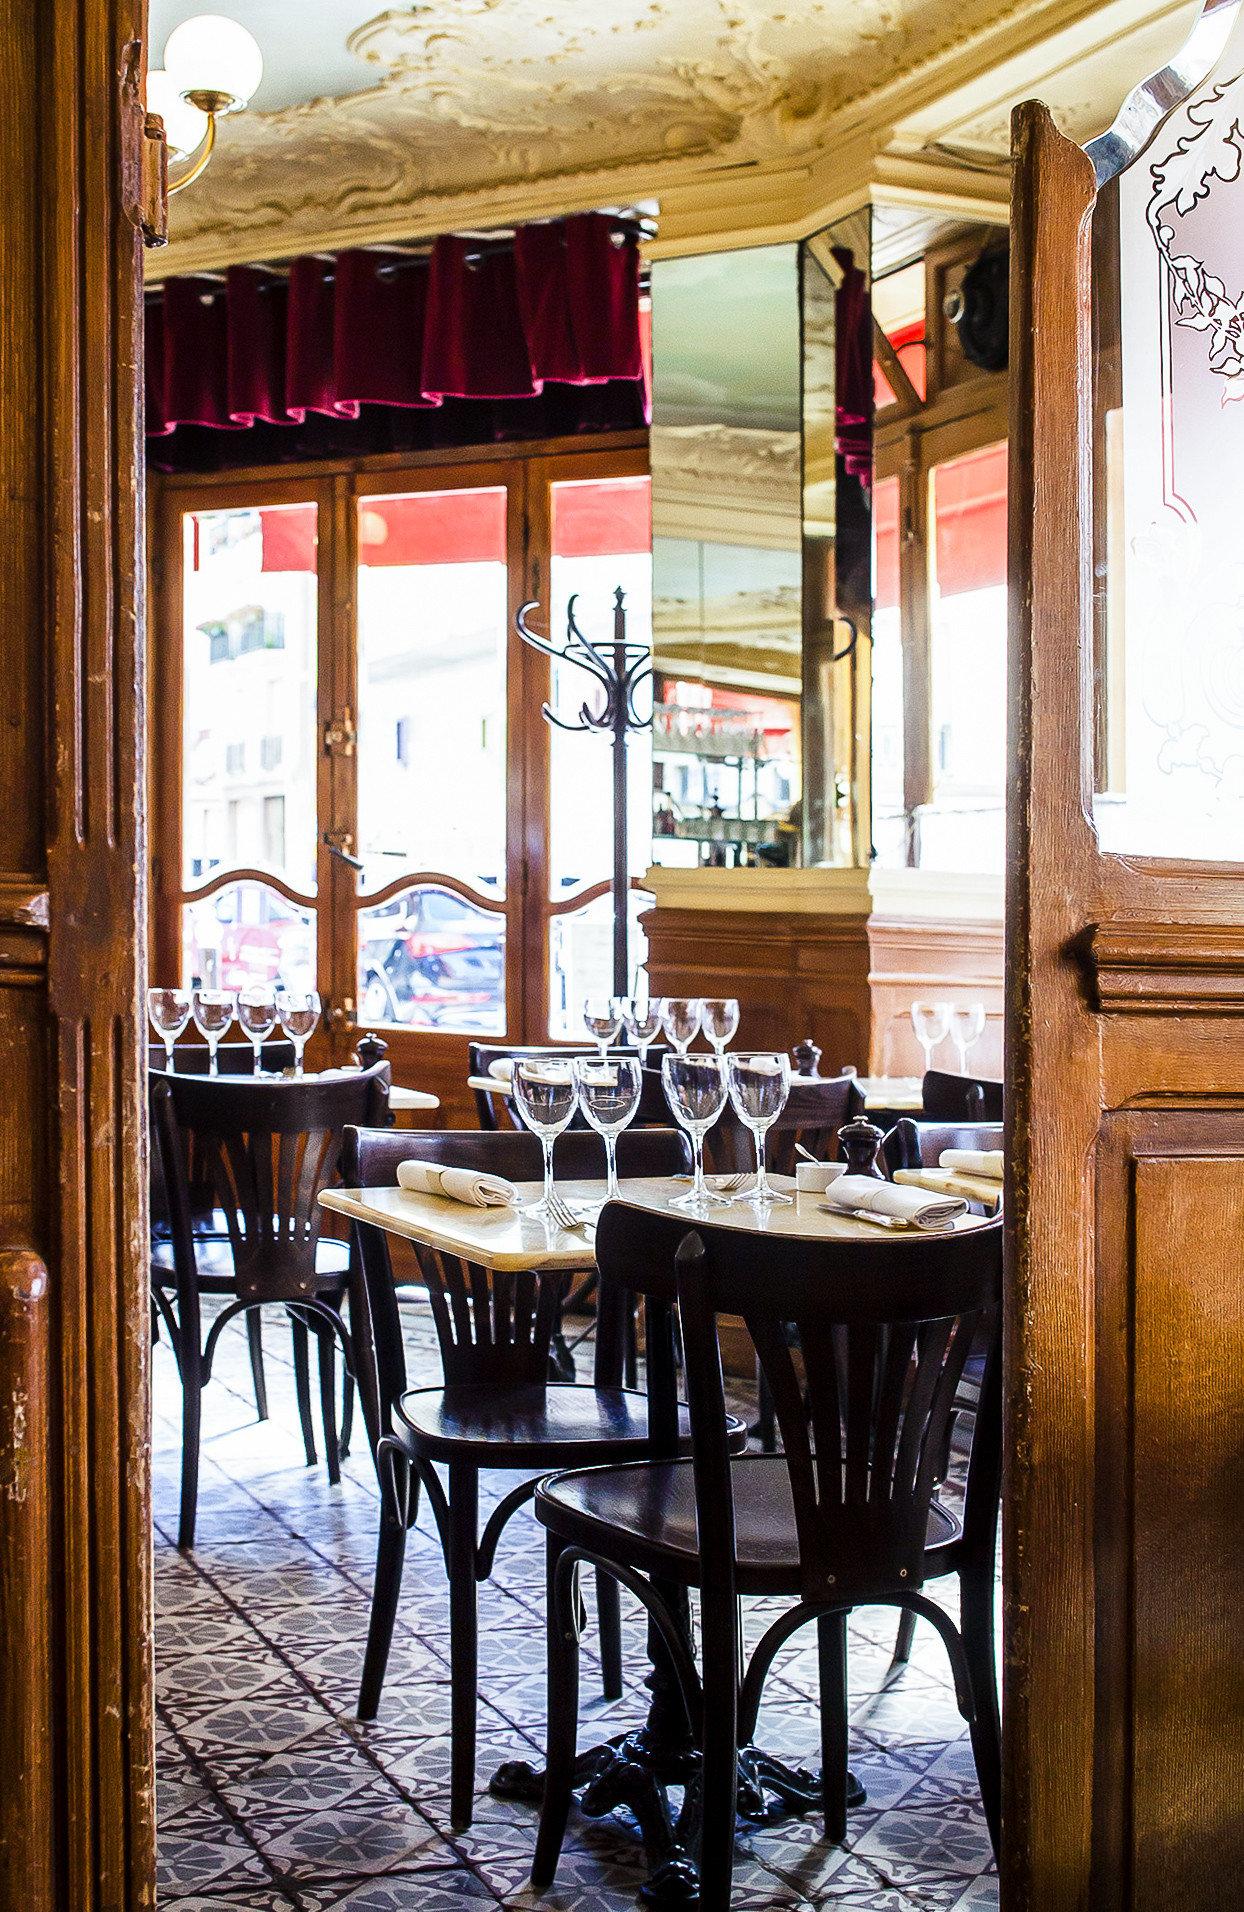 Food + Drink France Paris restaurant table dining room furniture interior design window café chair